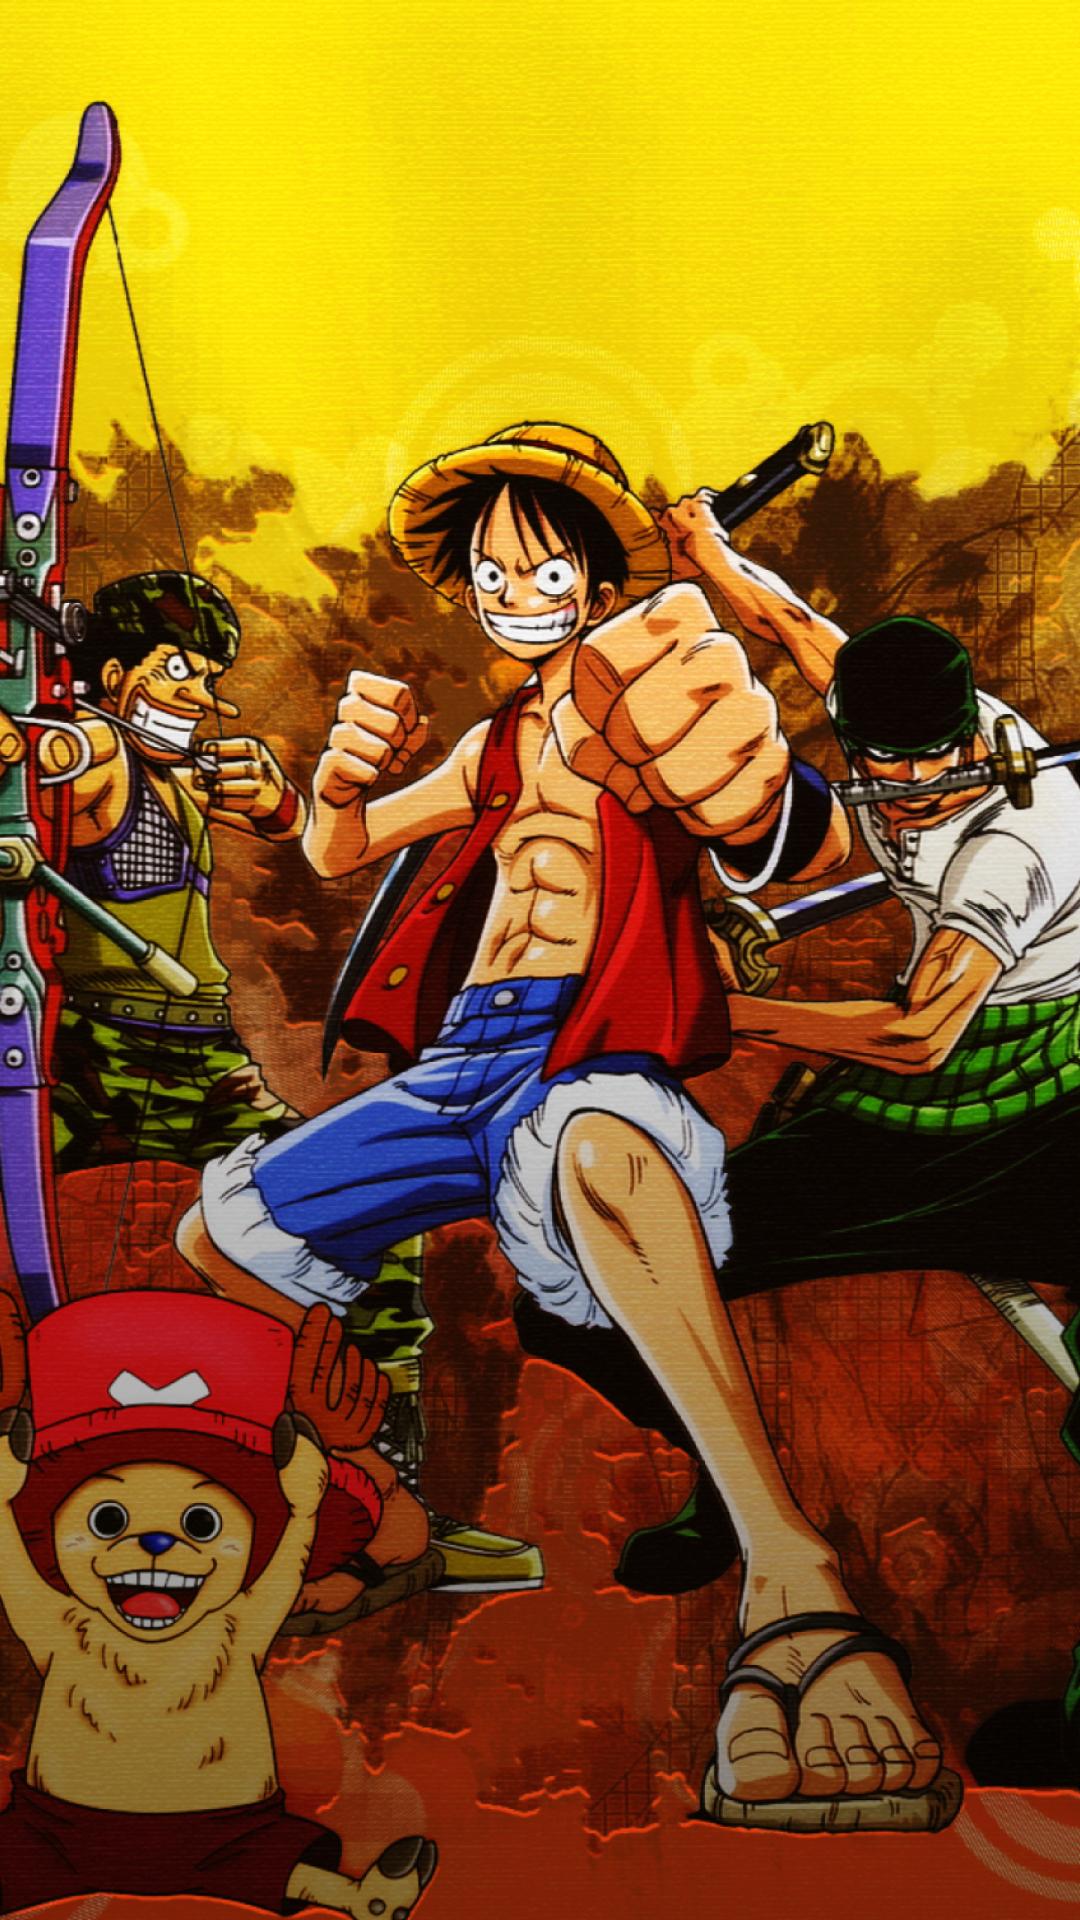 74 One Piece Phone Wallpaper On Wallpapersafari